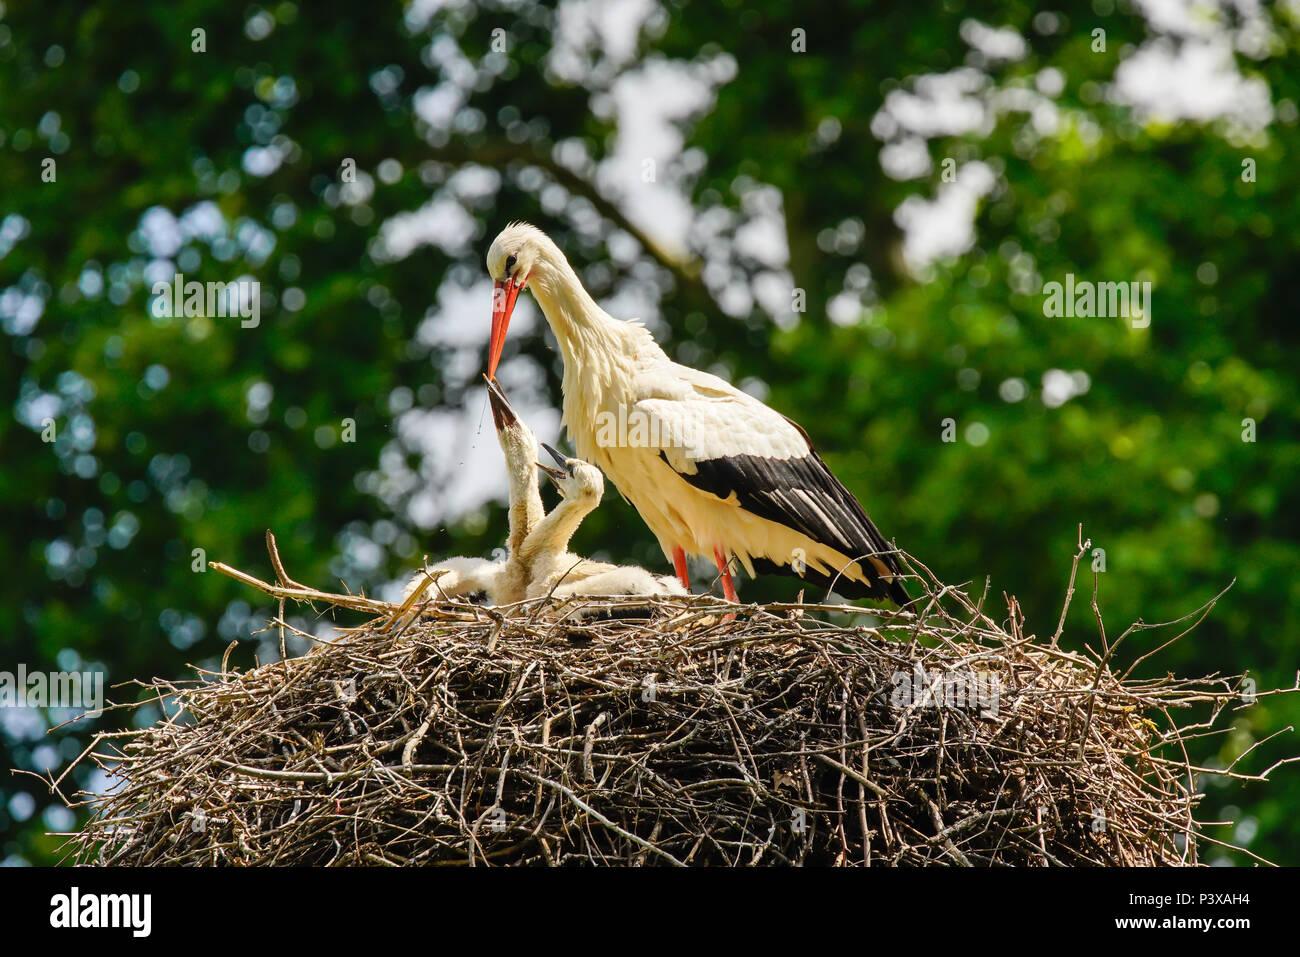 White Stork (Ciconia ciconia) feeding chicks on nest, Switzerland. Stock Photo